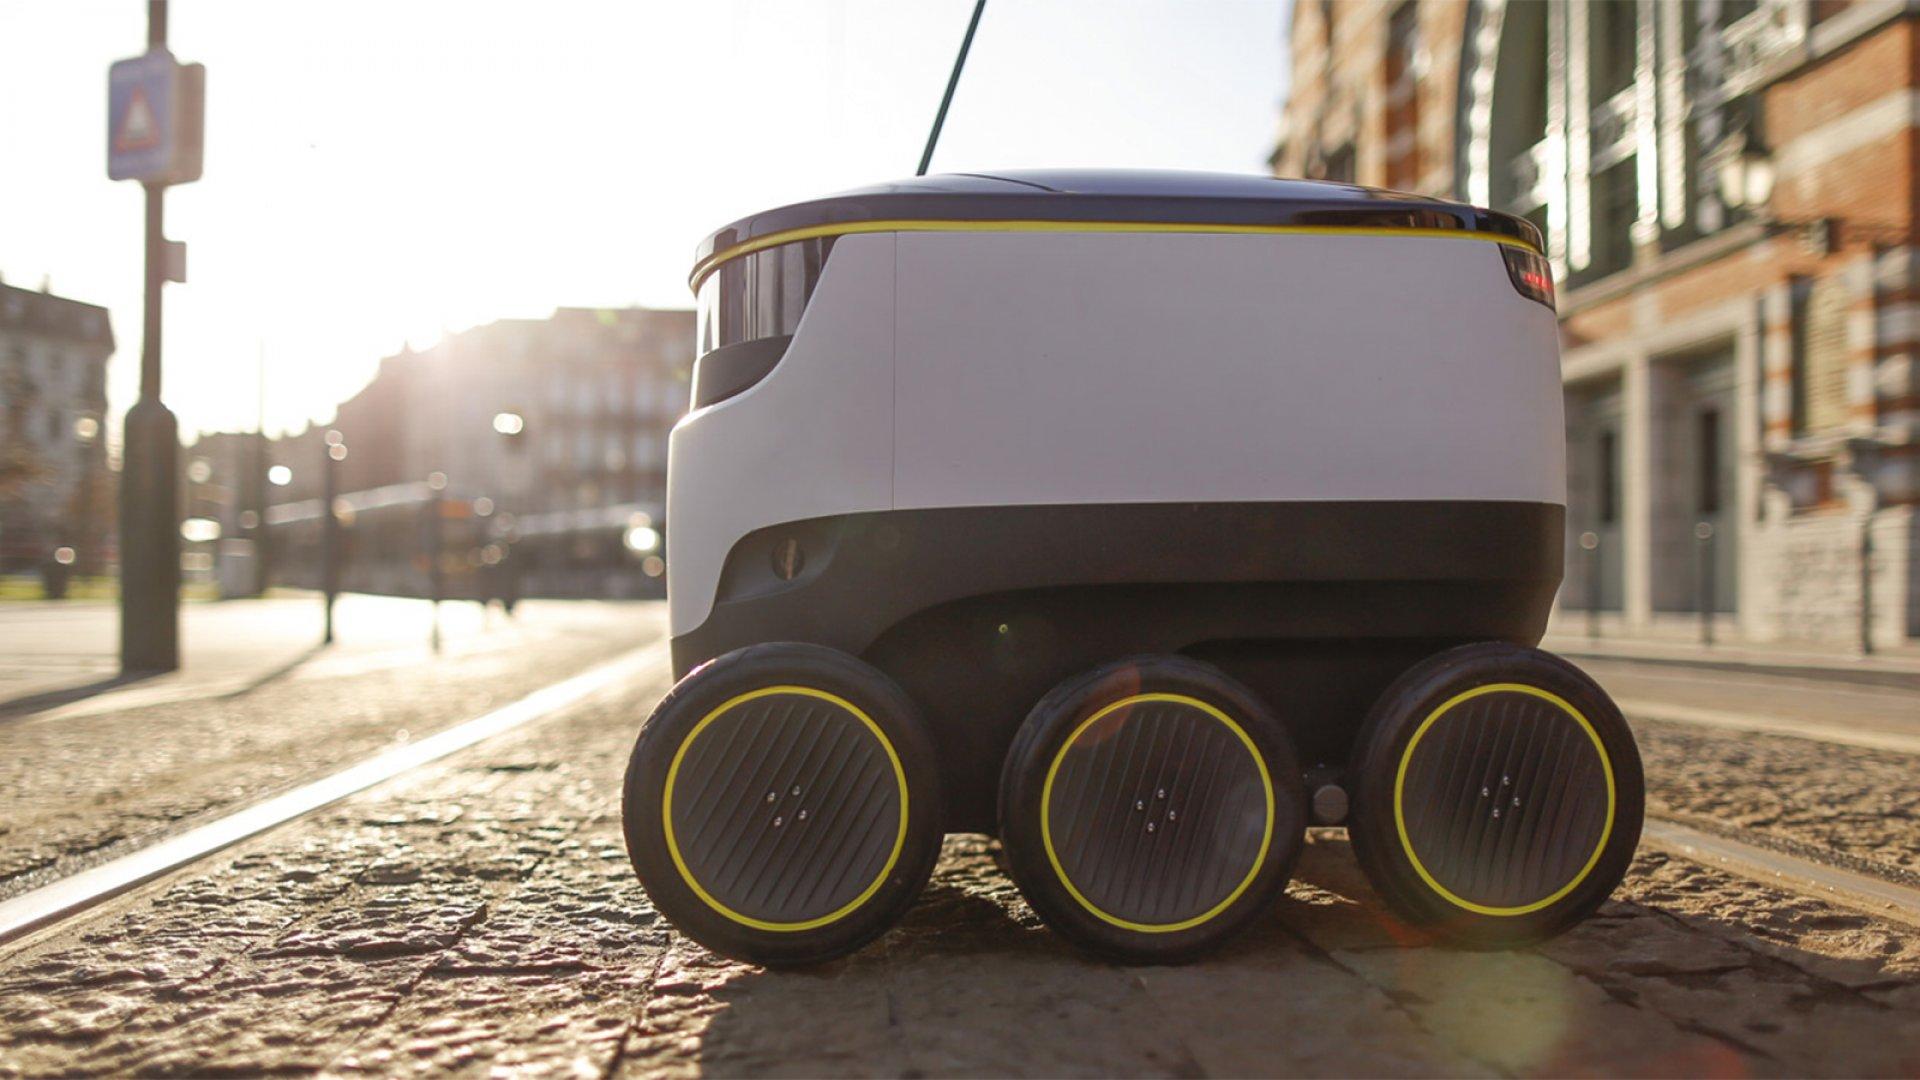 Autonomous Robot Delivery Is Now Legal in Florida